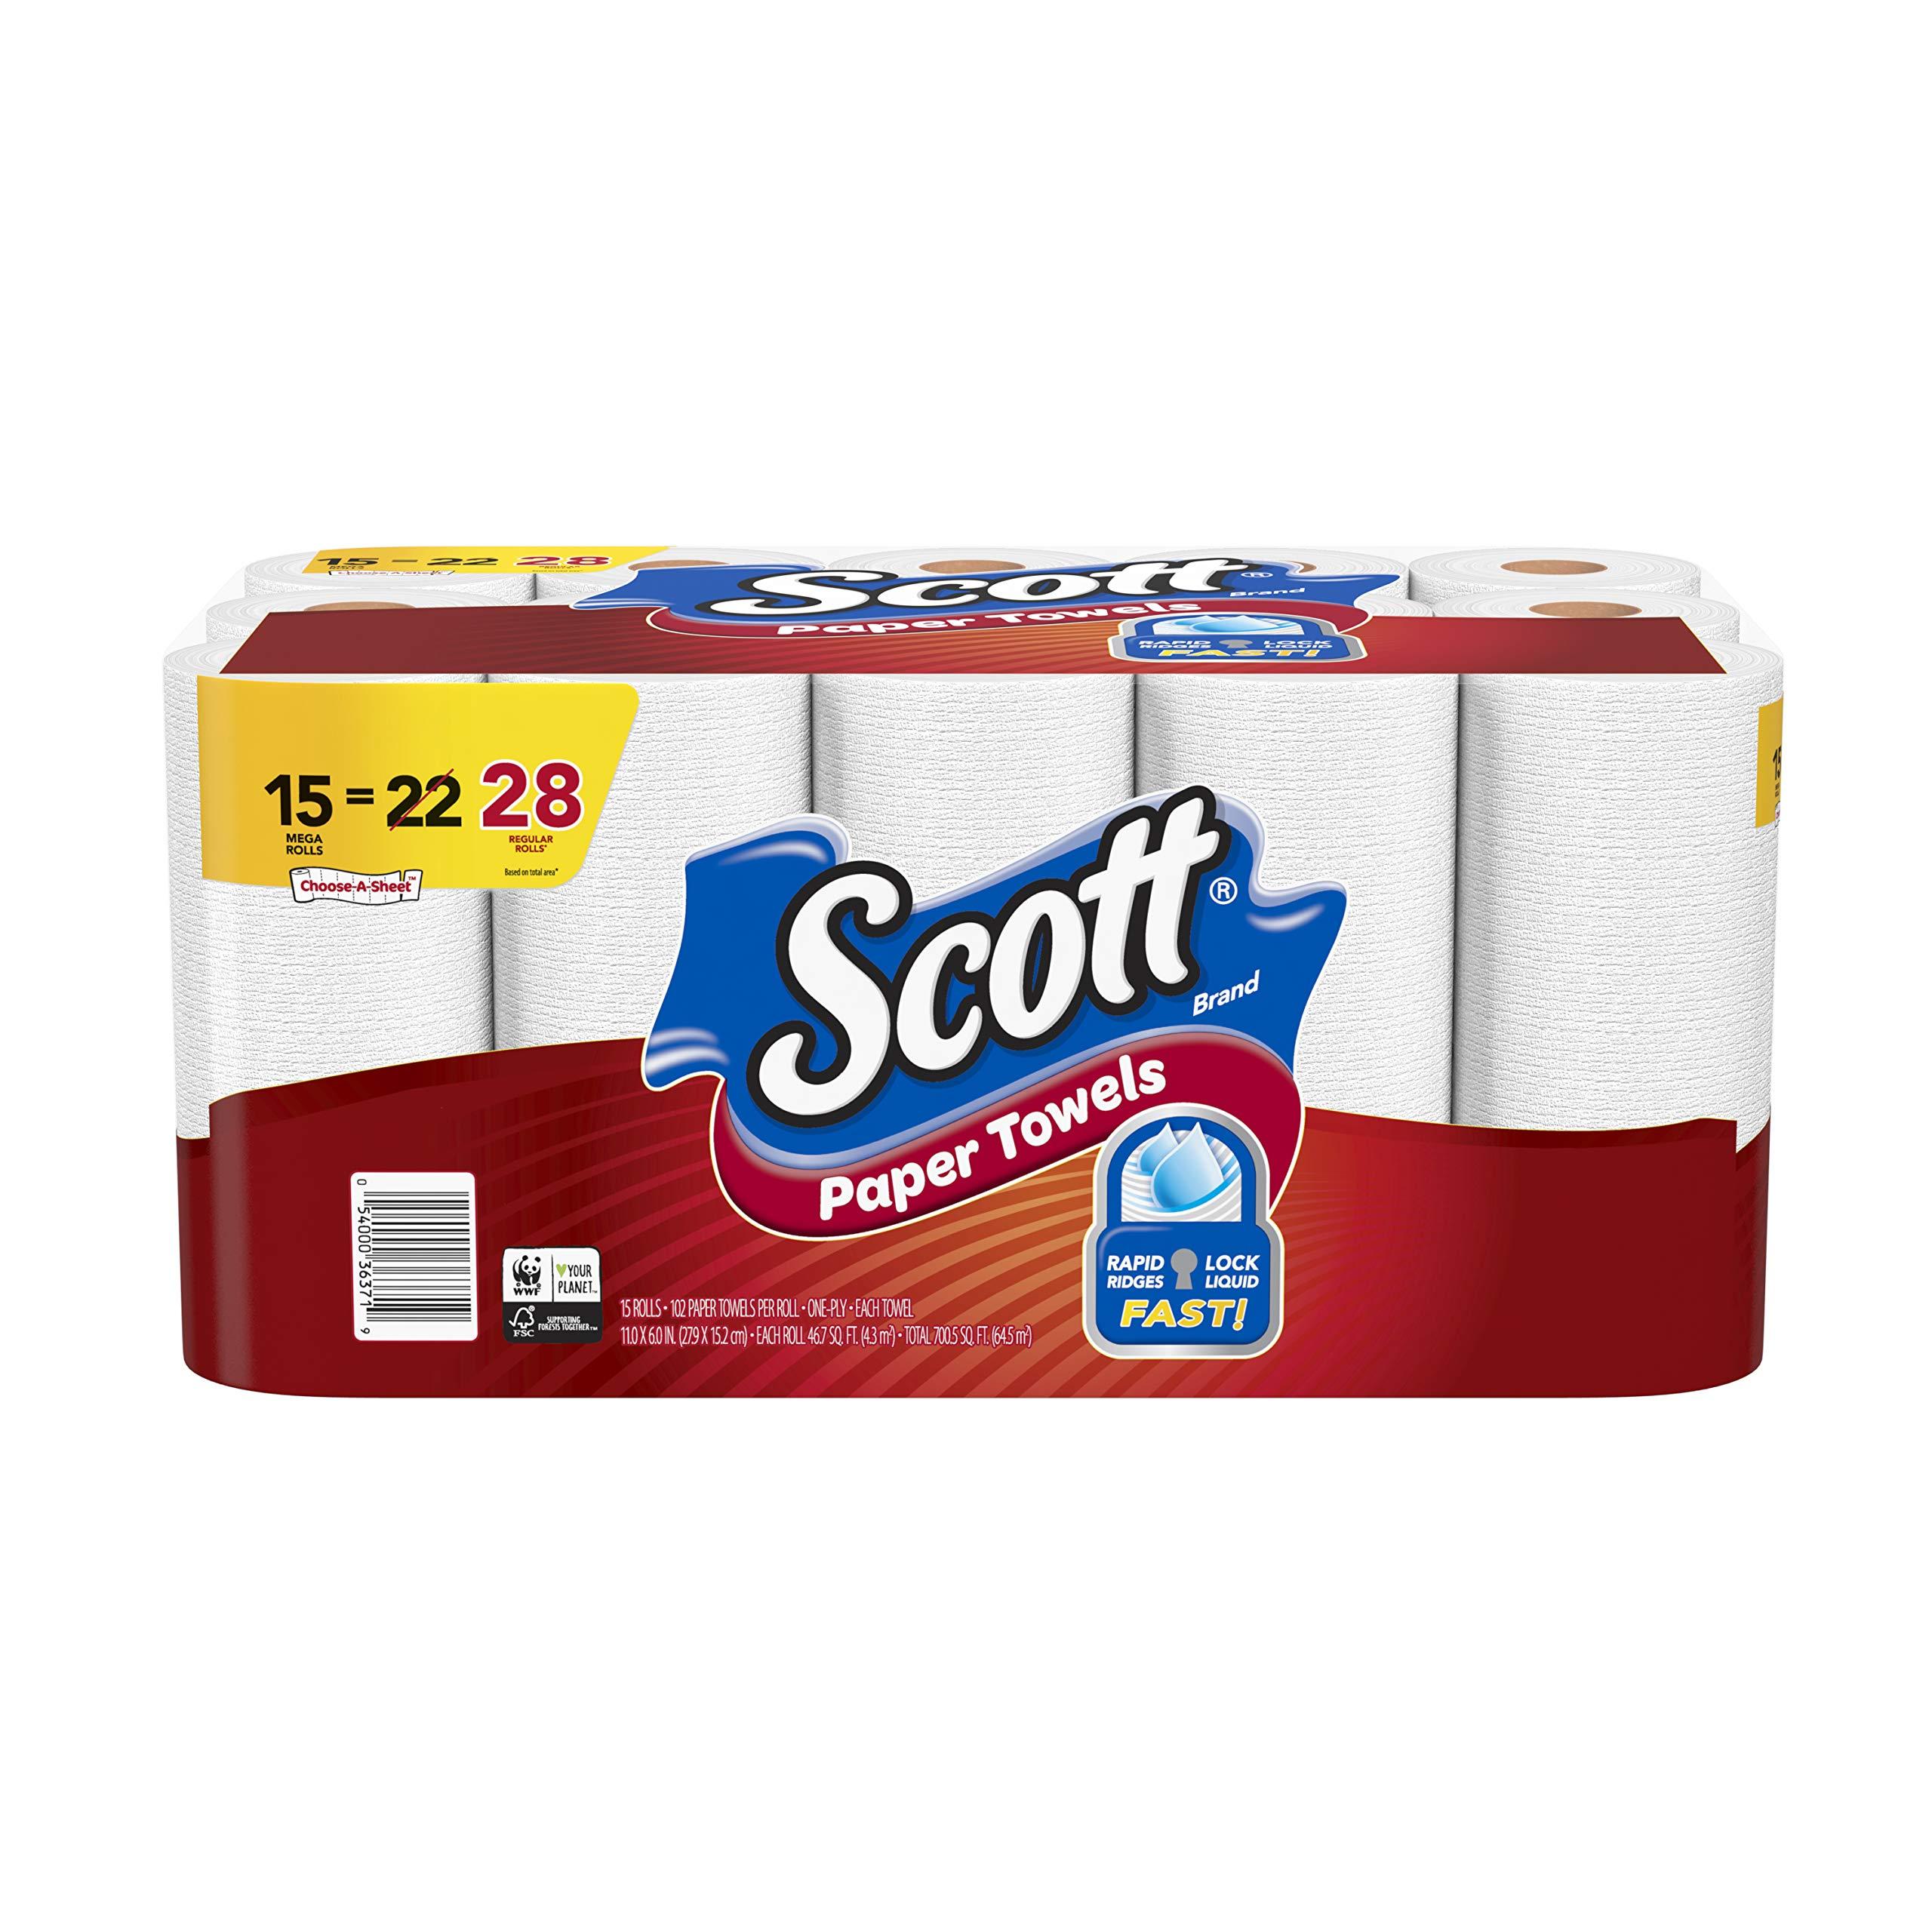 Scott Paper Towels Choose-A-Sheet, White, 15 Mega Rolls (2 Pack) by Scott Towel